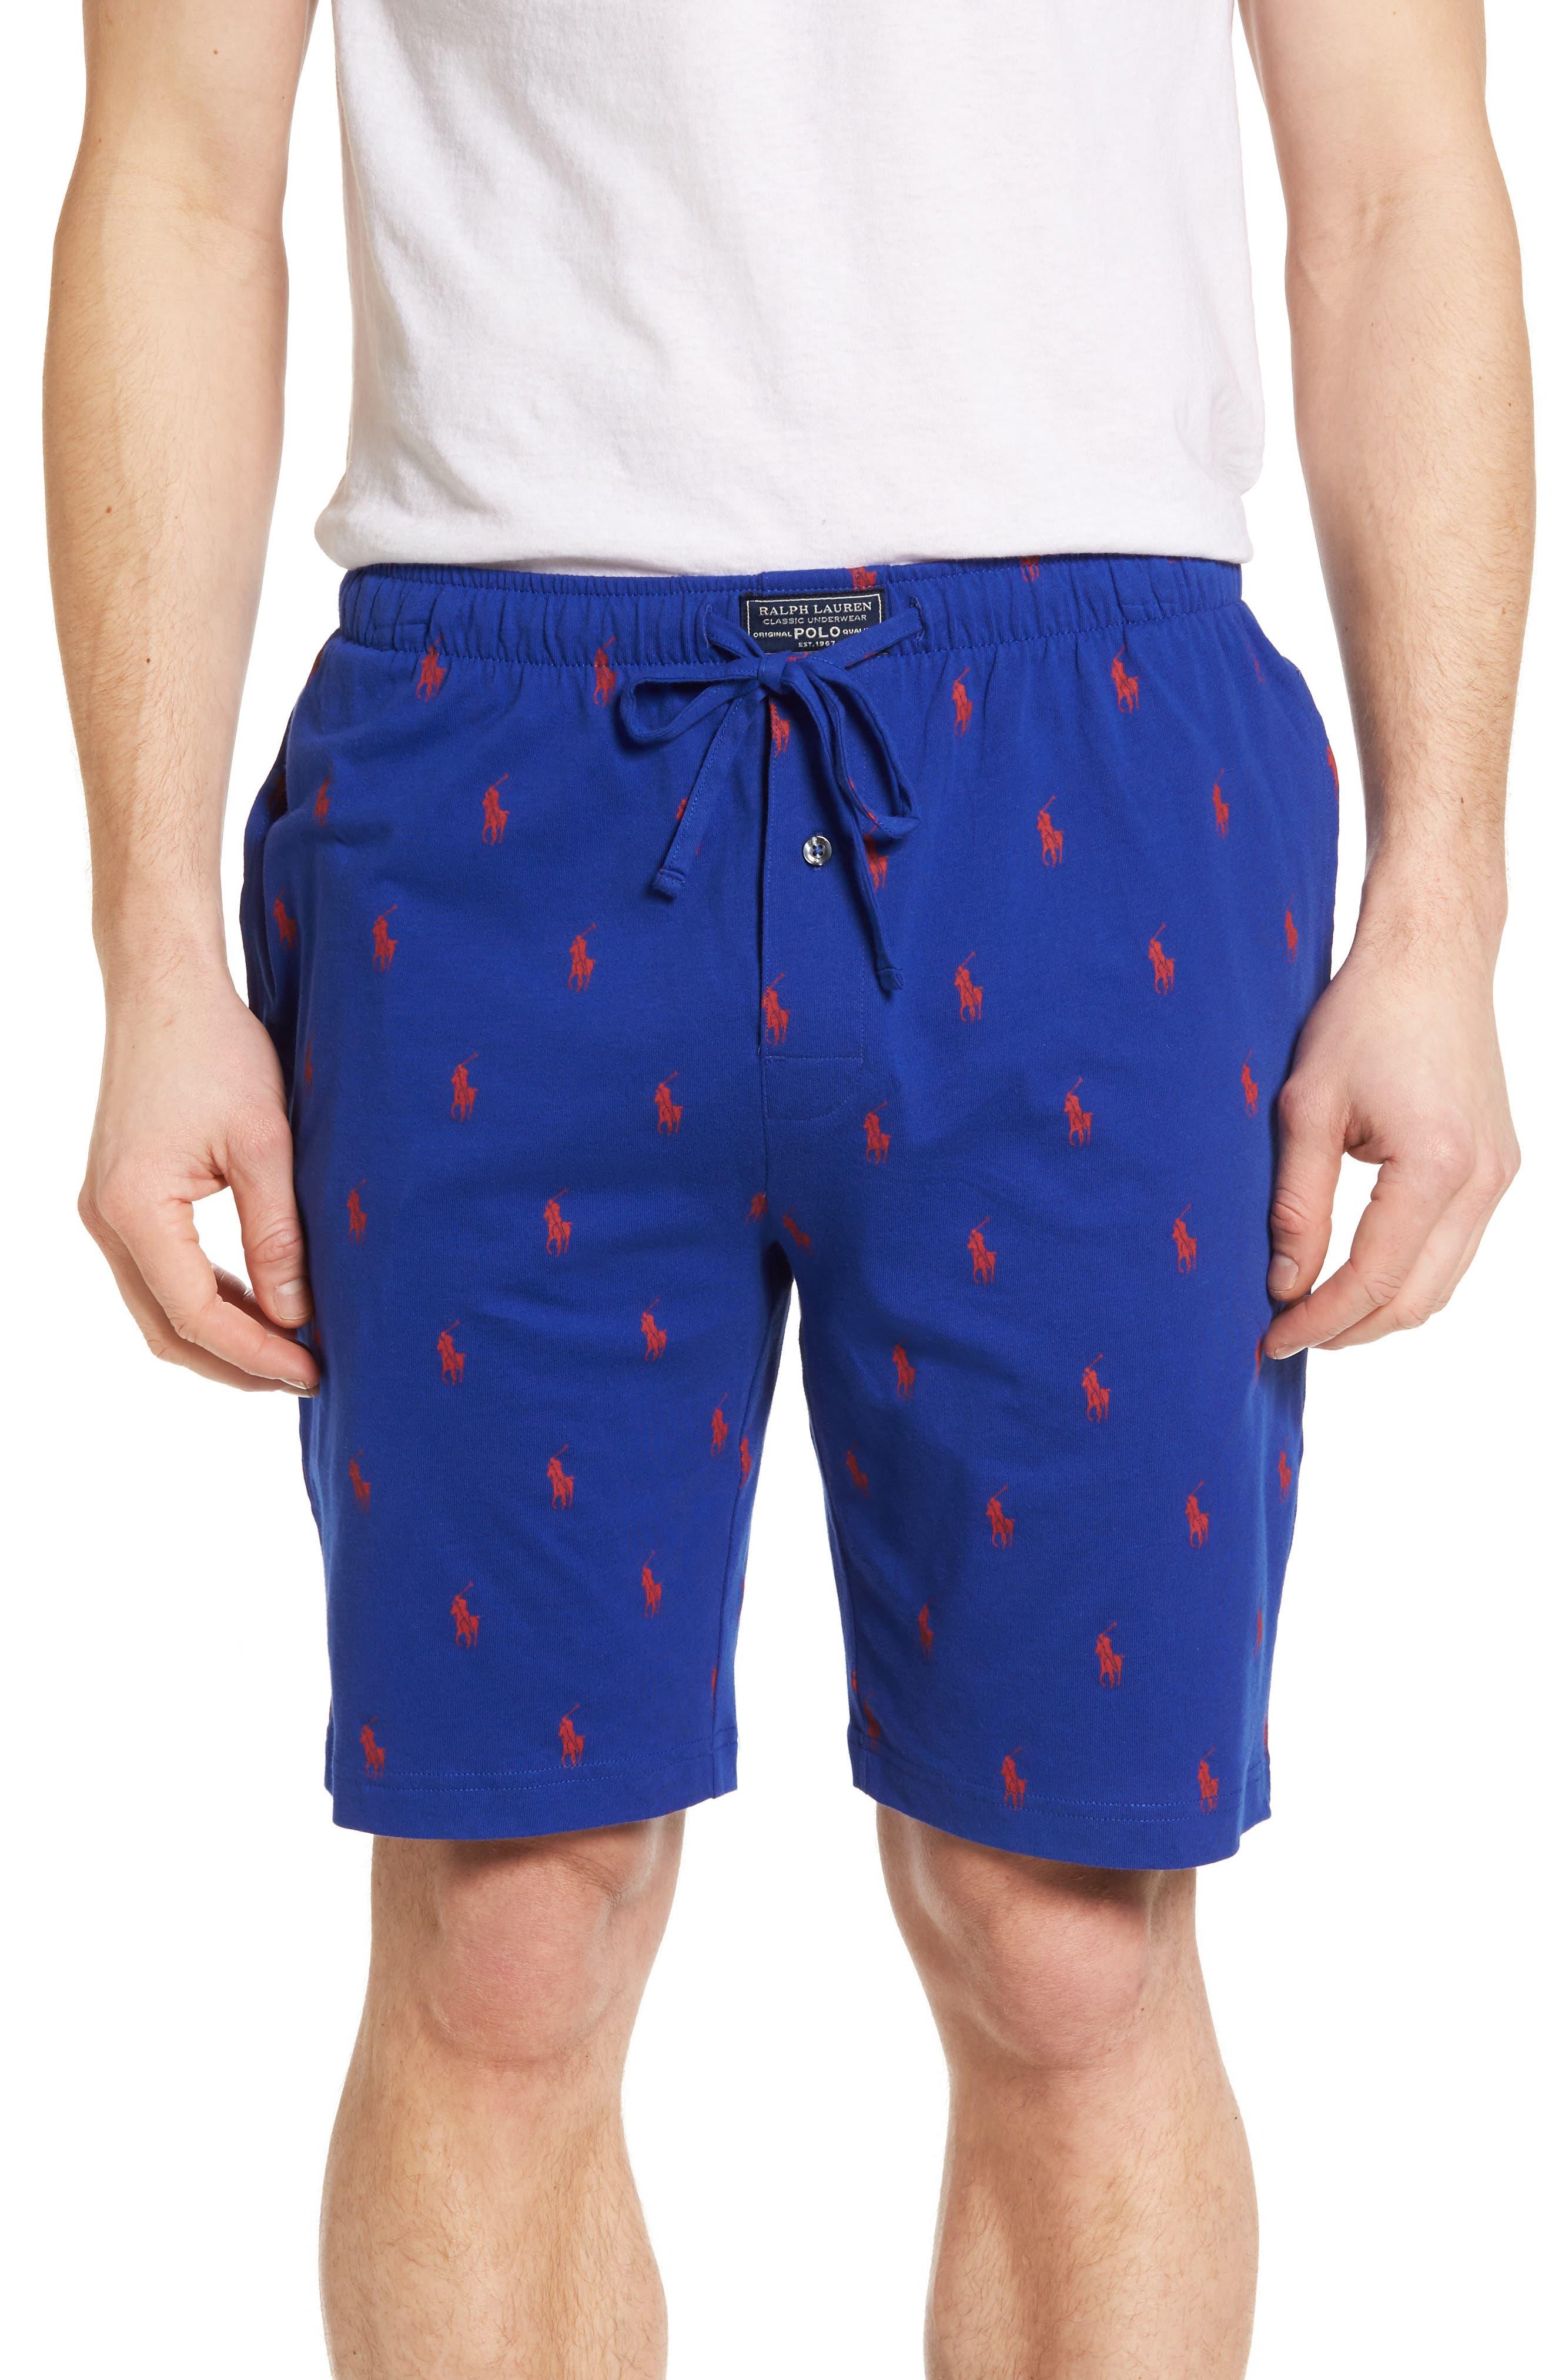 Cotton Sleep Shorts,                             Main thumbnail 1, color,                             Logan Sapphire